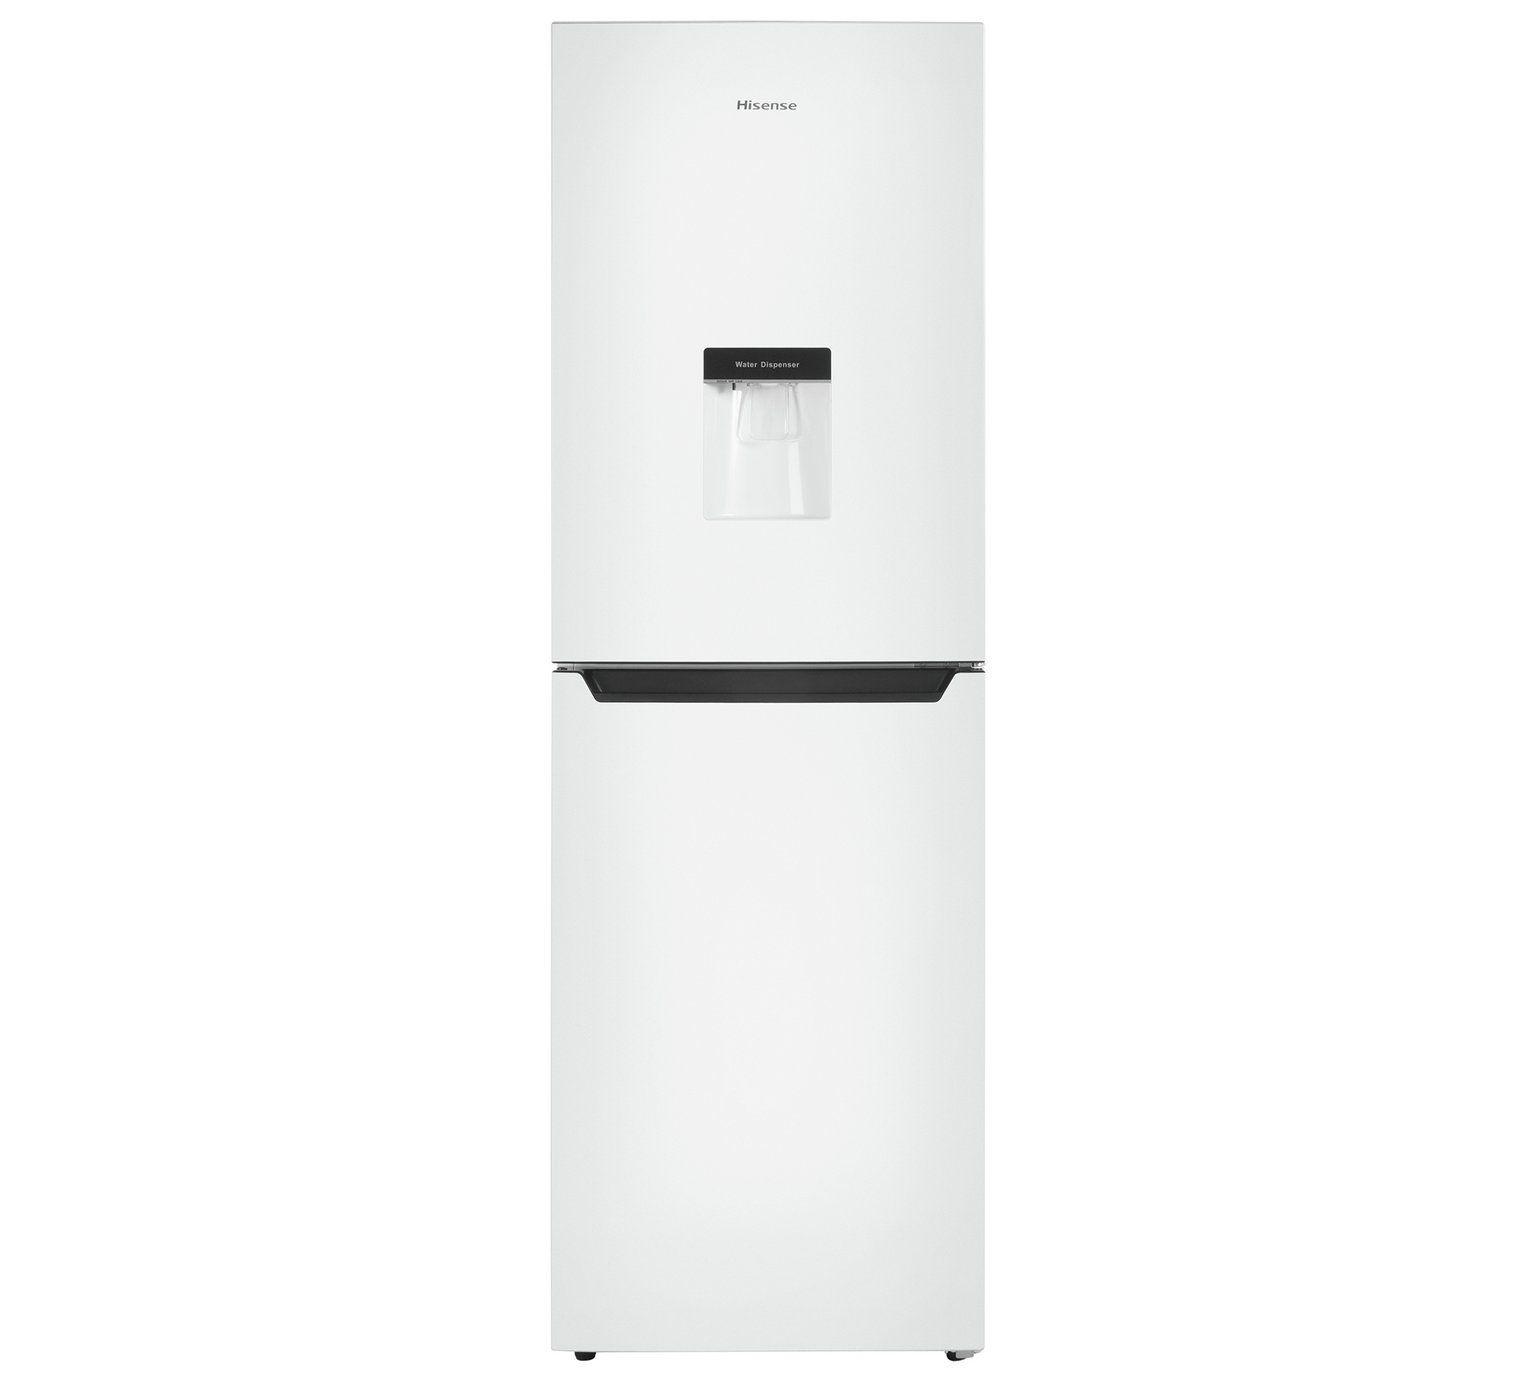 Buy Hisense RB320D4WW1 Fridge Freezer - White at Argos.co.uk, visit ...